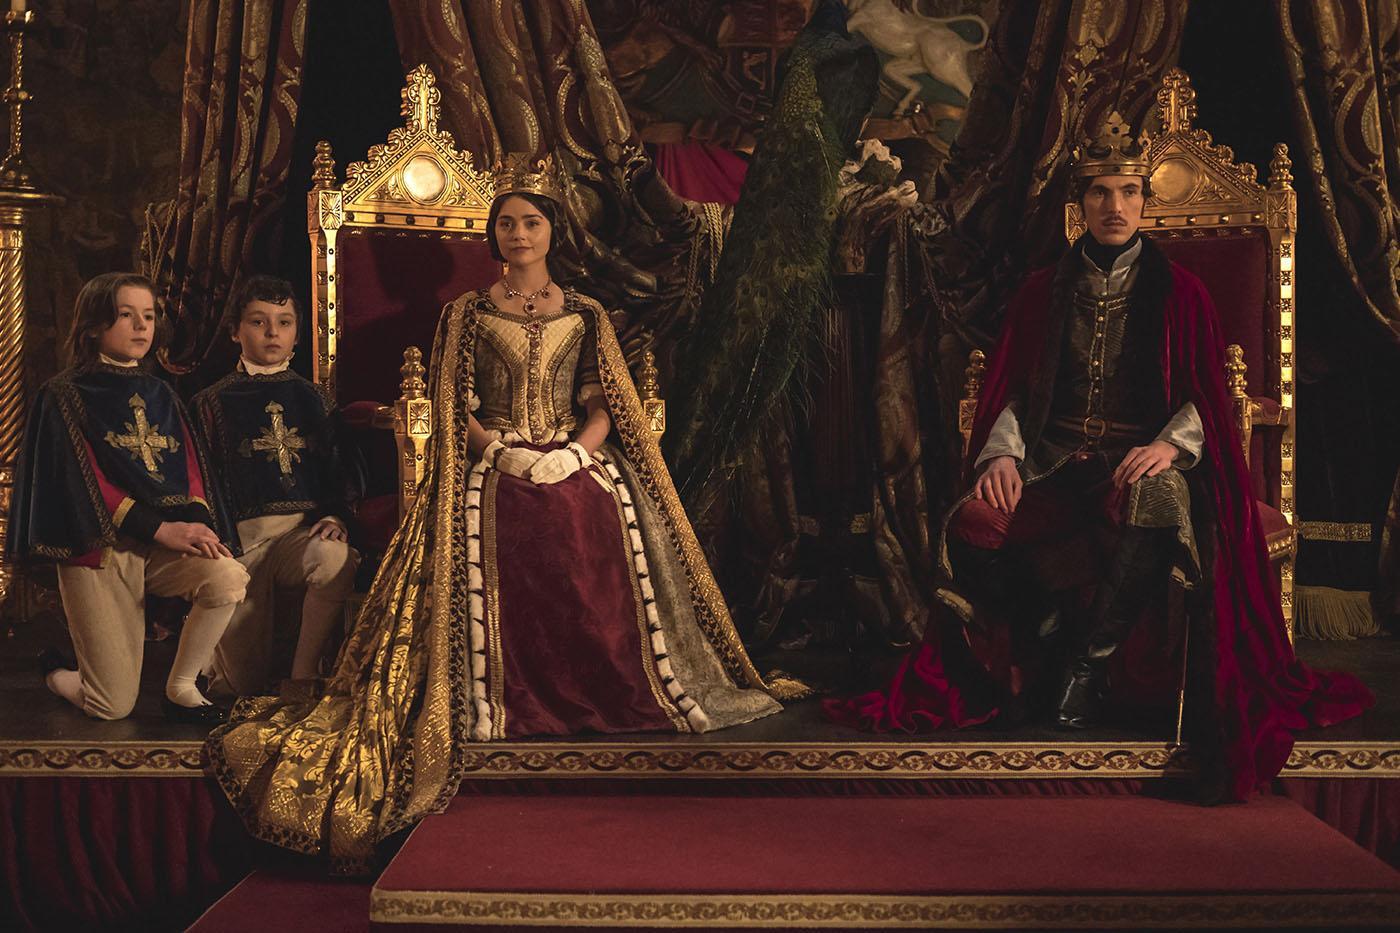 Queen Victoria and Prince Albert. Photo: Courtesy of ITV Studios